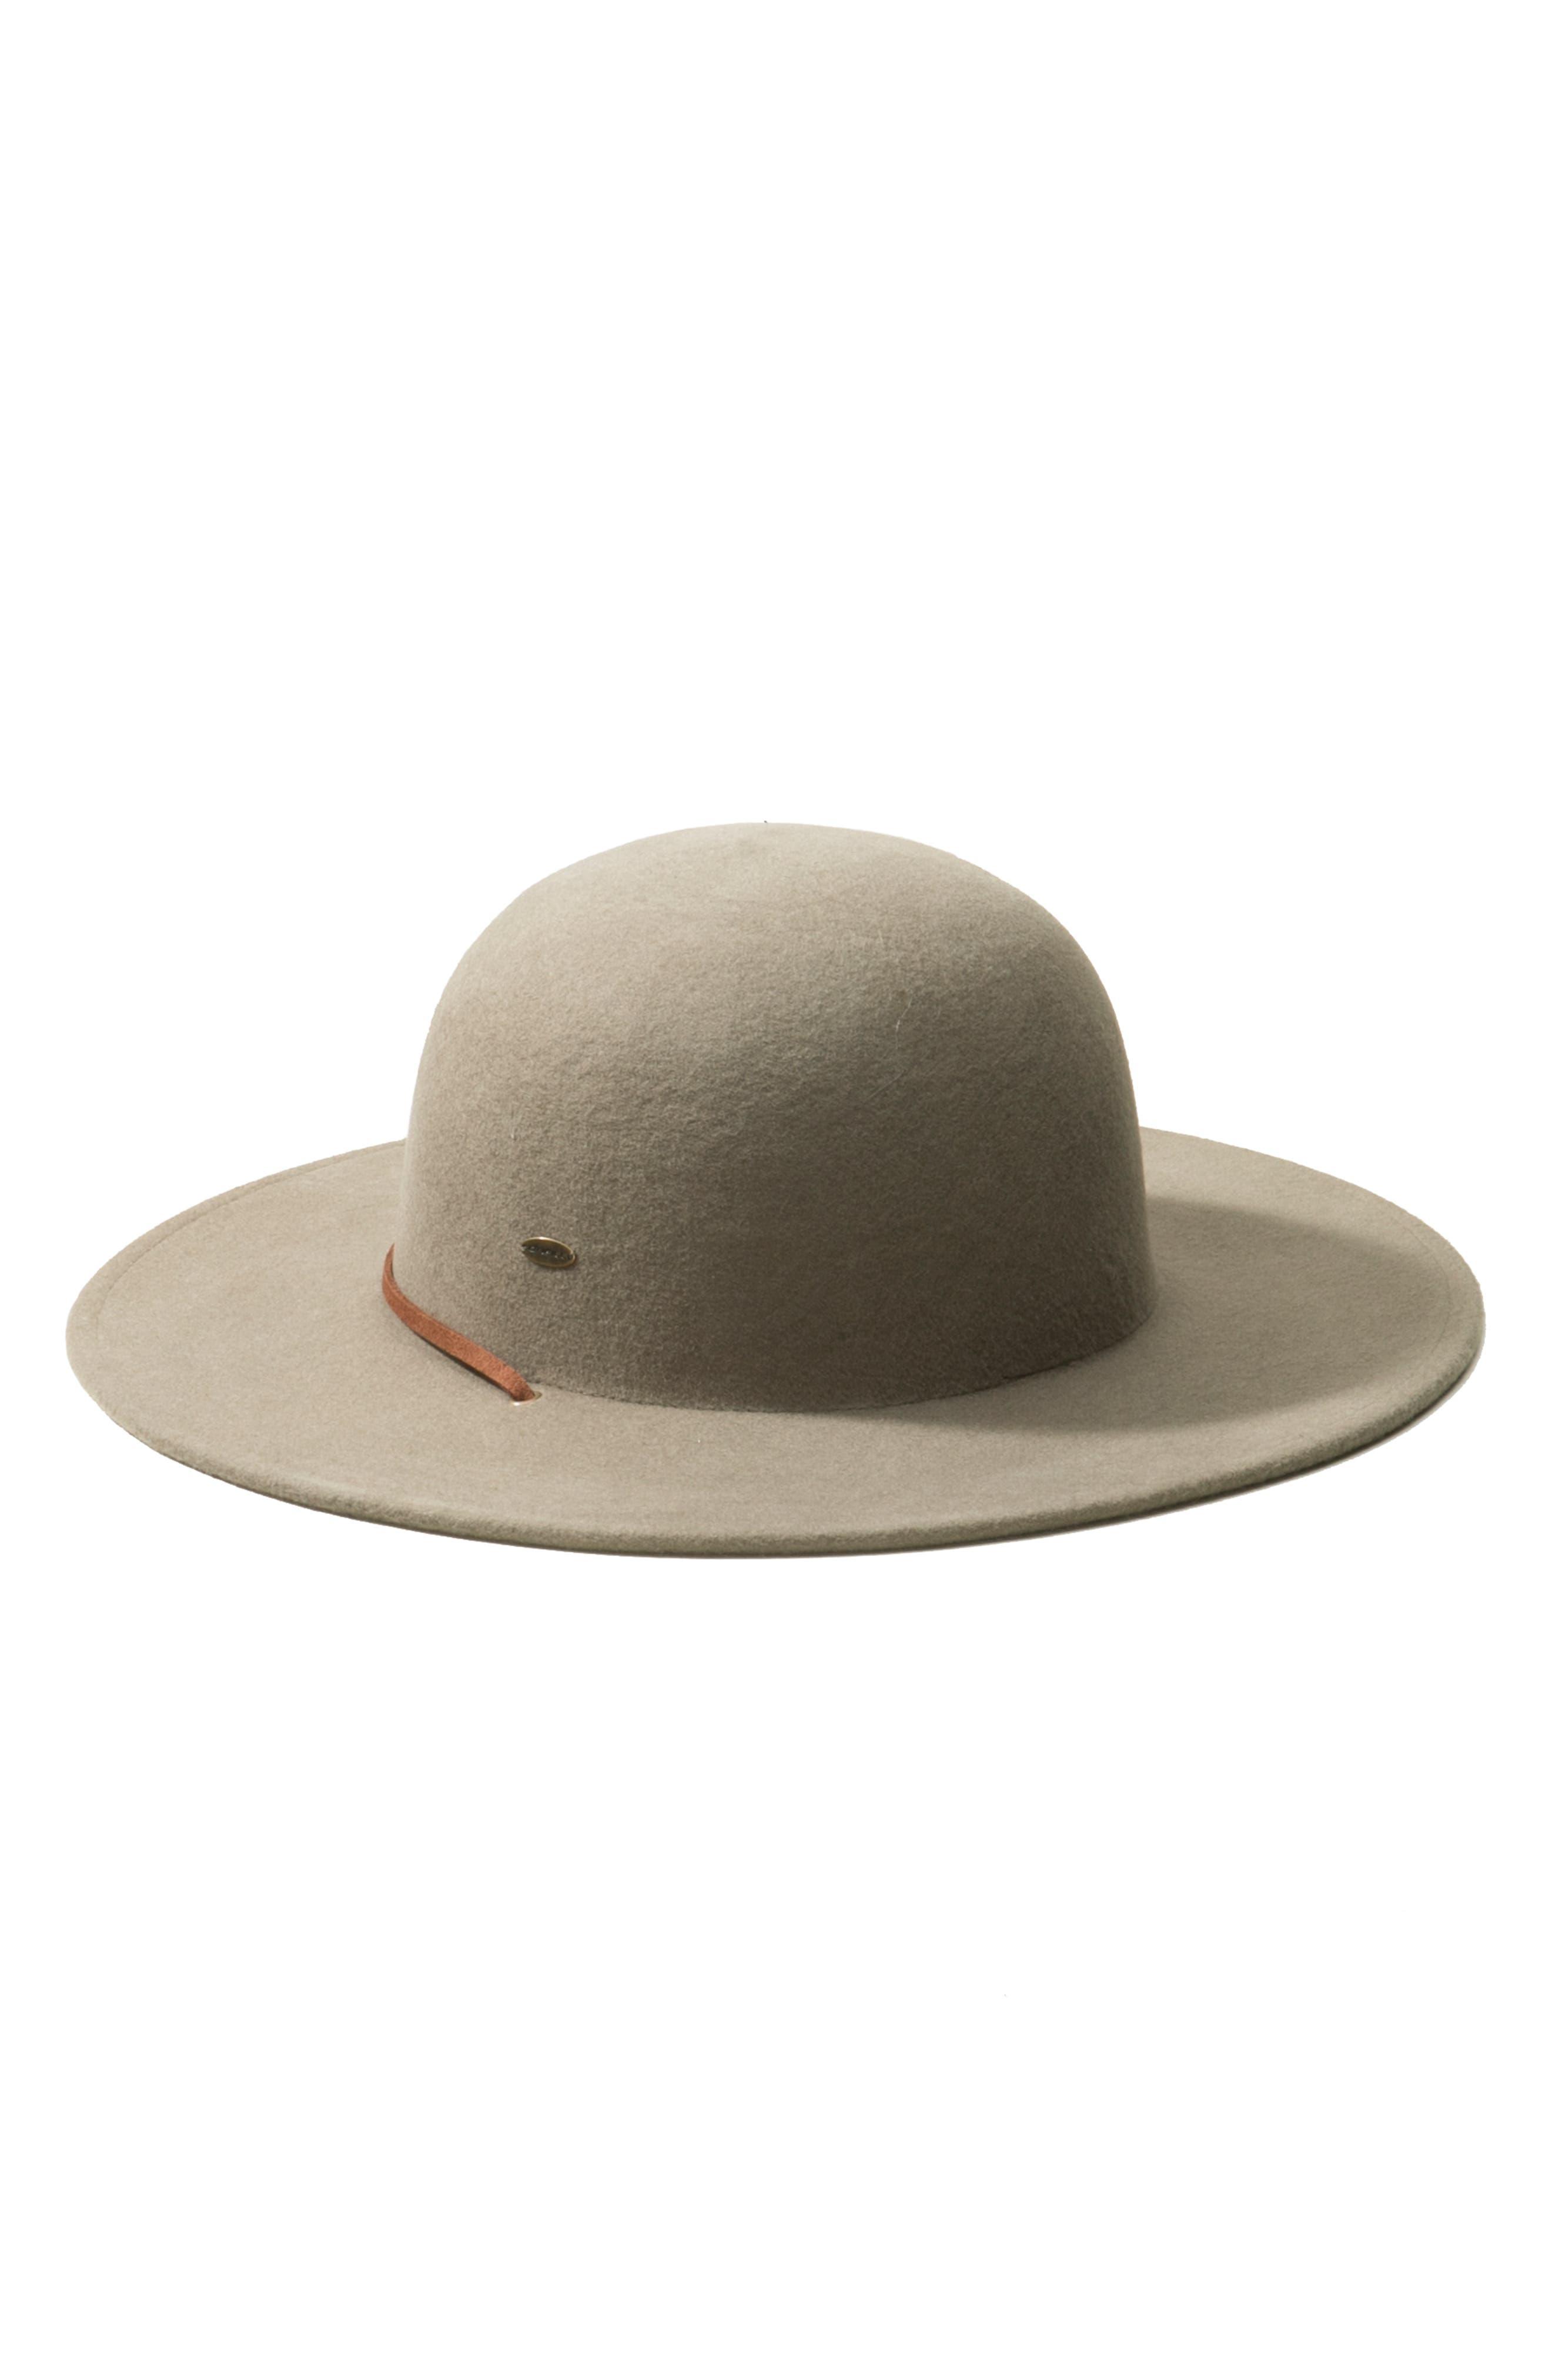 Trail Ride Wool Felt Hat,                             Alternate thumbnail 2, color,                             KANGAROO